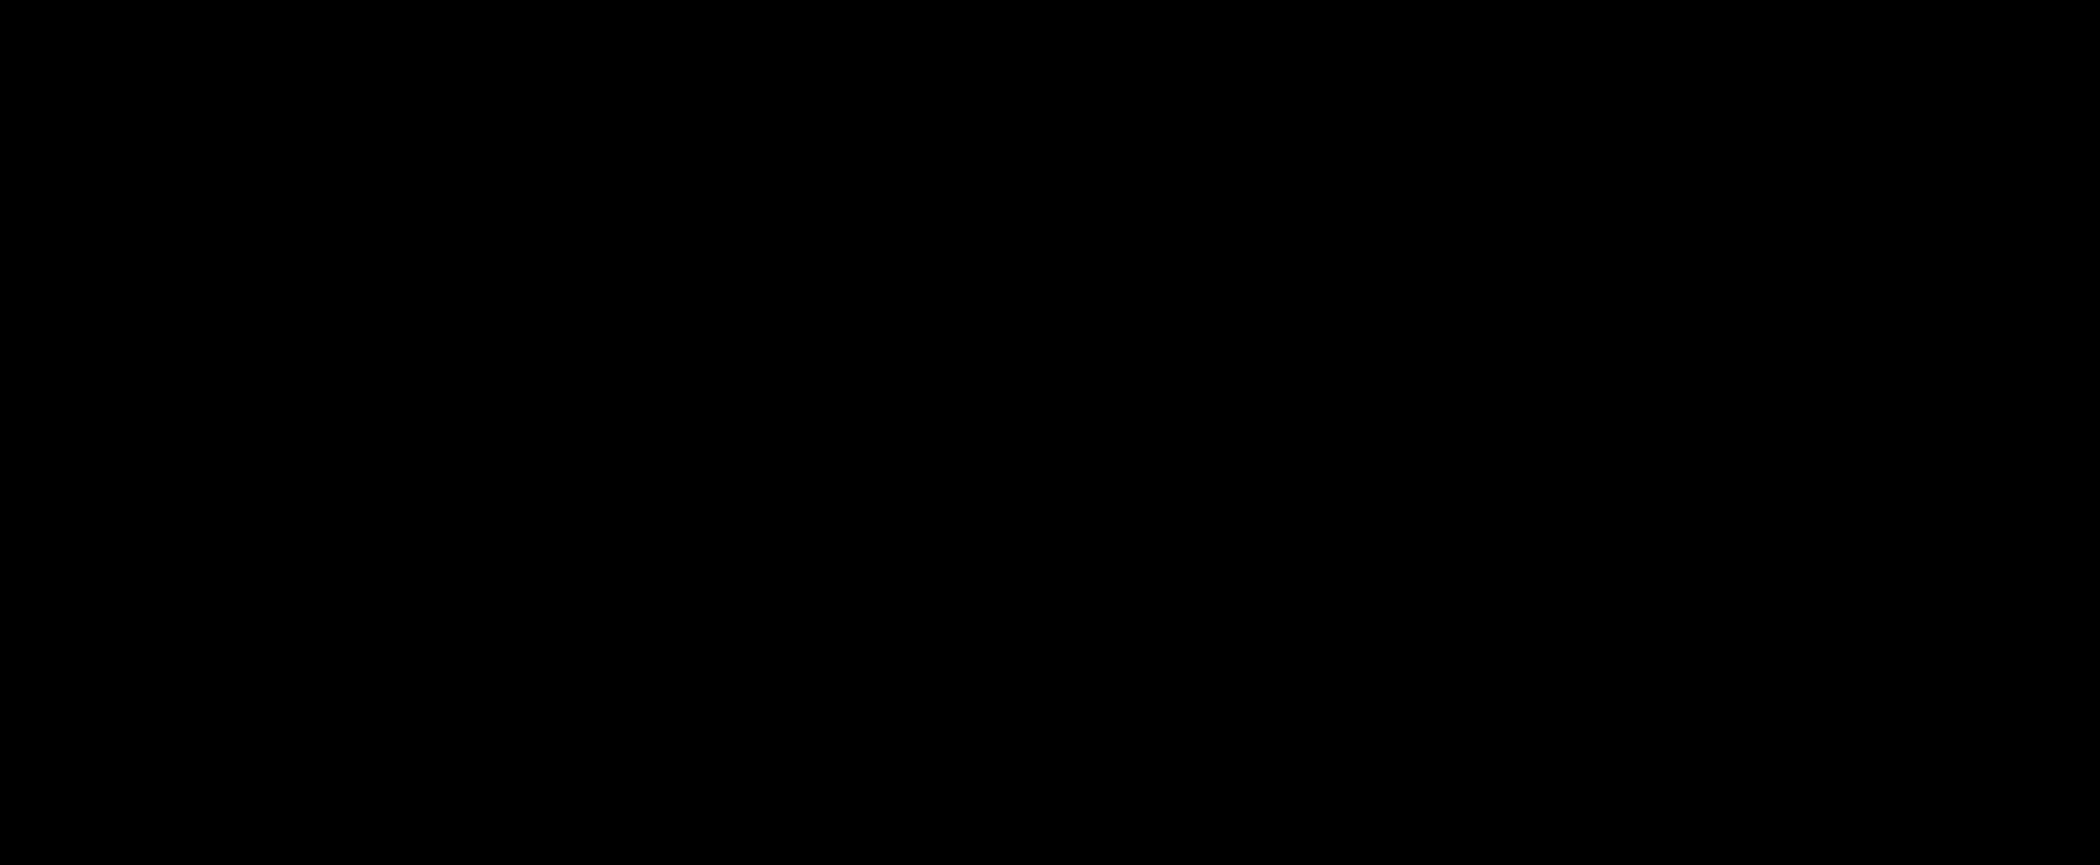 hbo logo 1 - HBO Logo